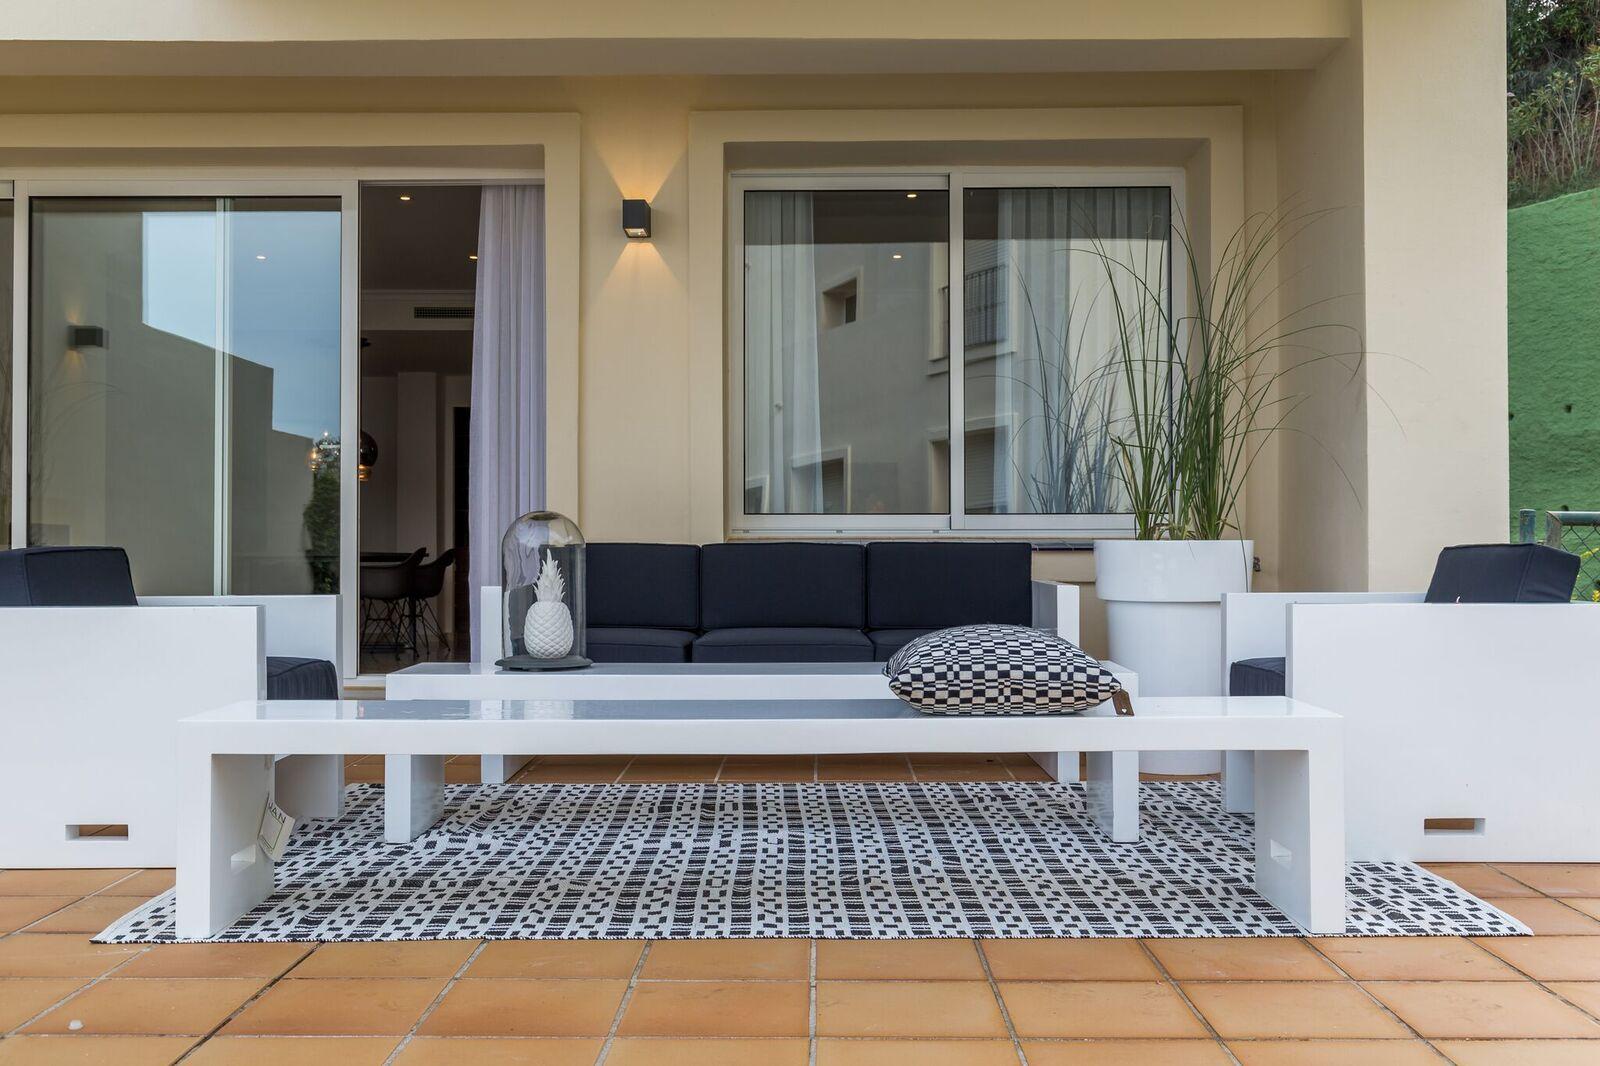 La-Mairena-Terrace-Exterior-1